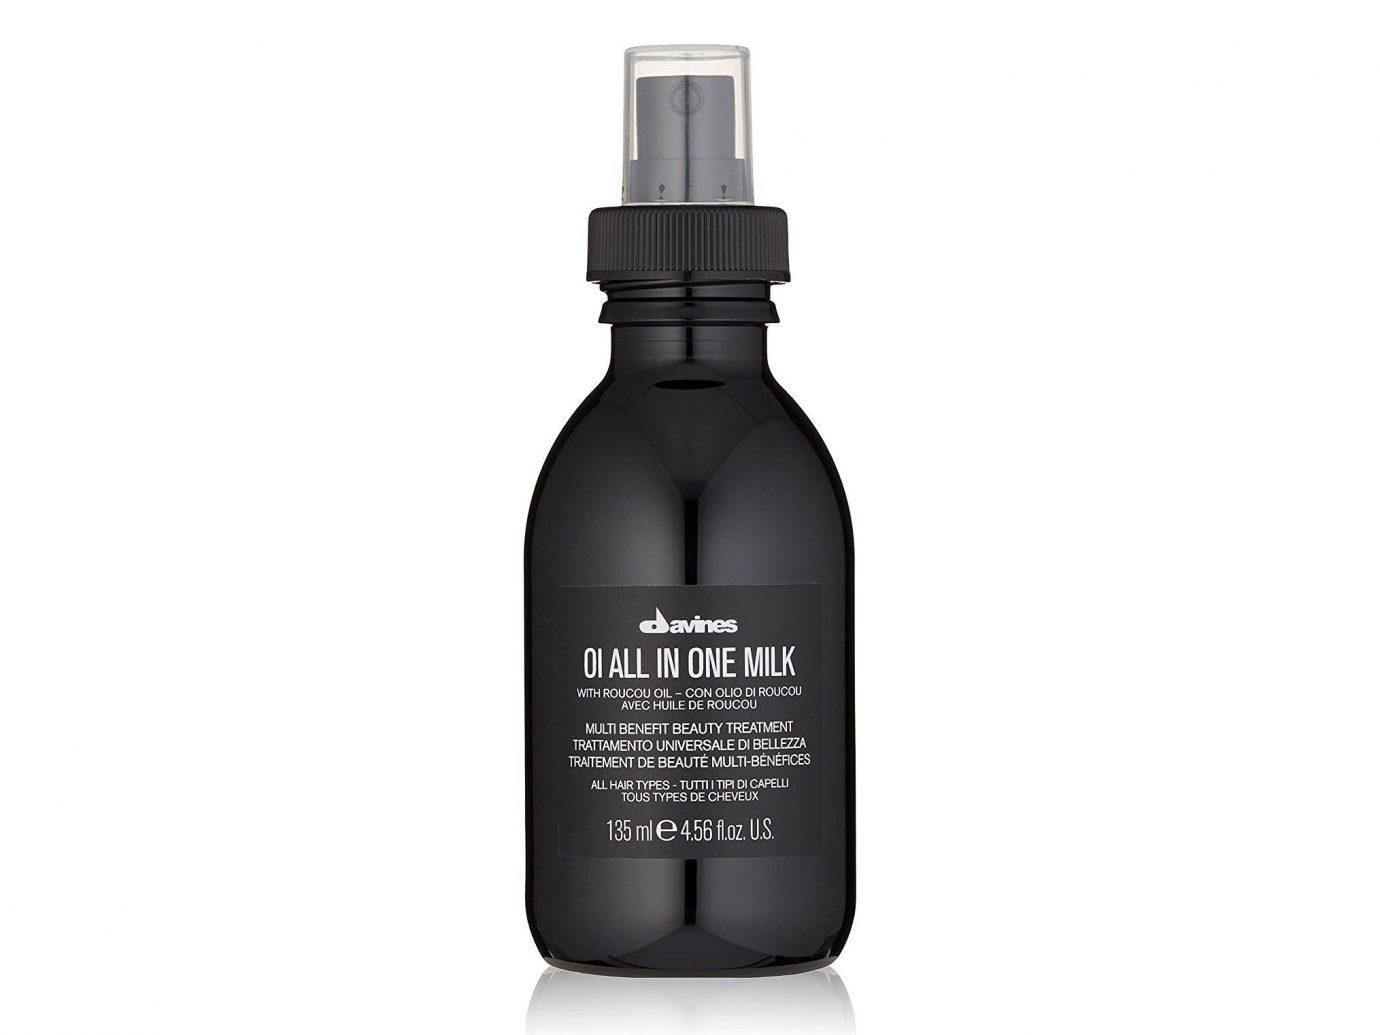 Beauty Travel Shop product toiletry liquid health & beauty skin care